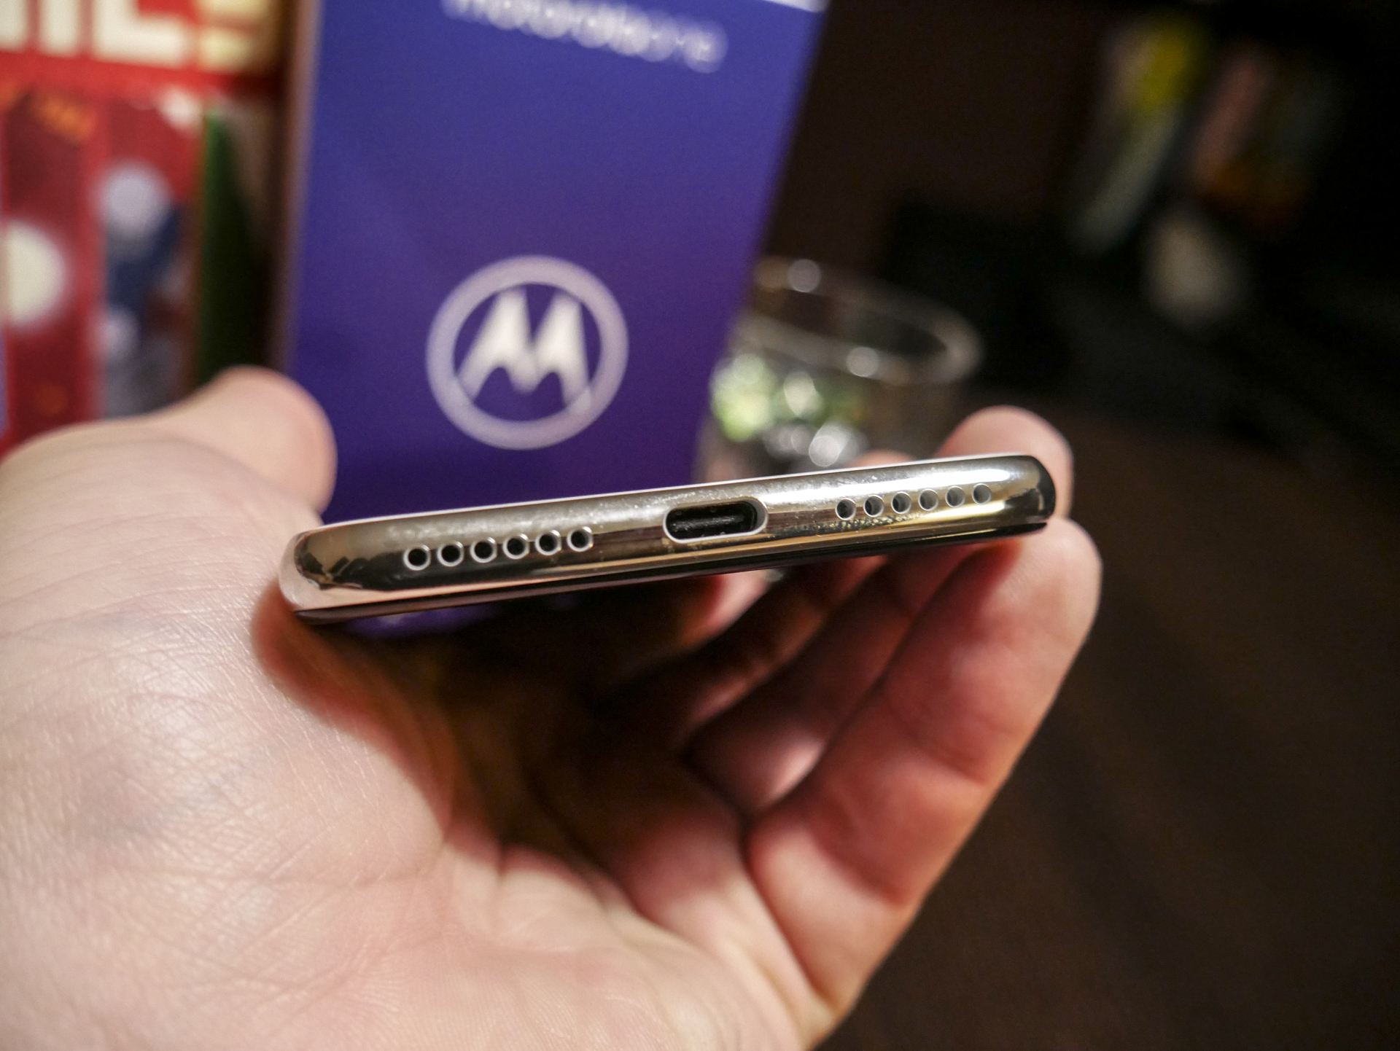 recenzja Motorola One, opinia Motorola One, wrażenia Motorola One, motorola, moto one, opinie Motorola One, testy Motorola One, recenzje Motorola One, review Motorola One, smartfon Motorola One,